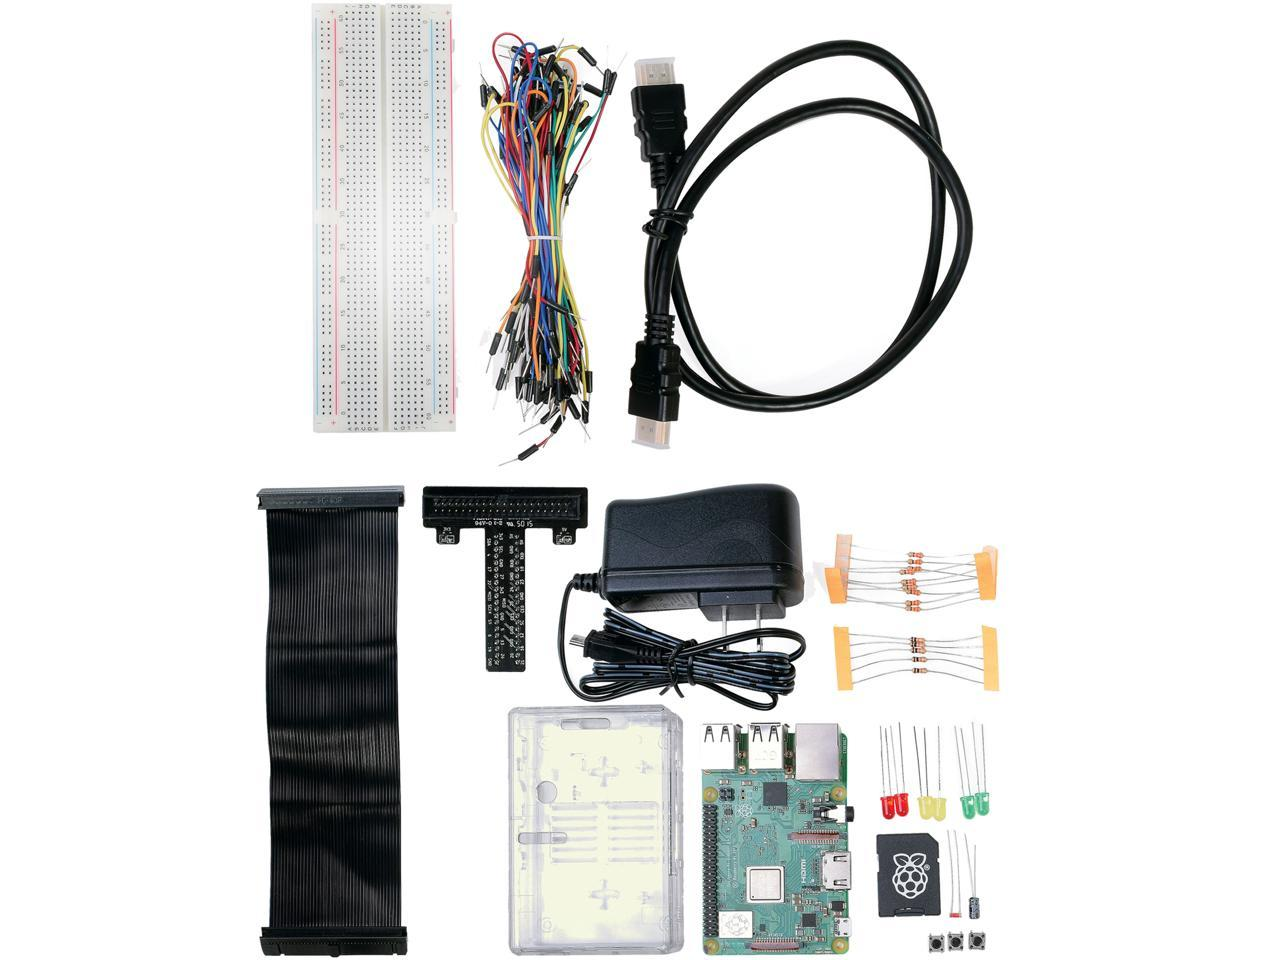 Raspberry Pi 3 Model B+ Physical Computing Kit - Newegg com